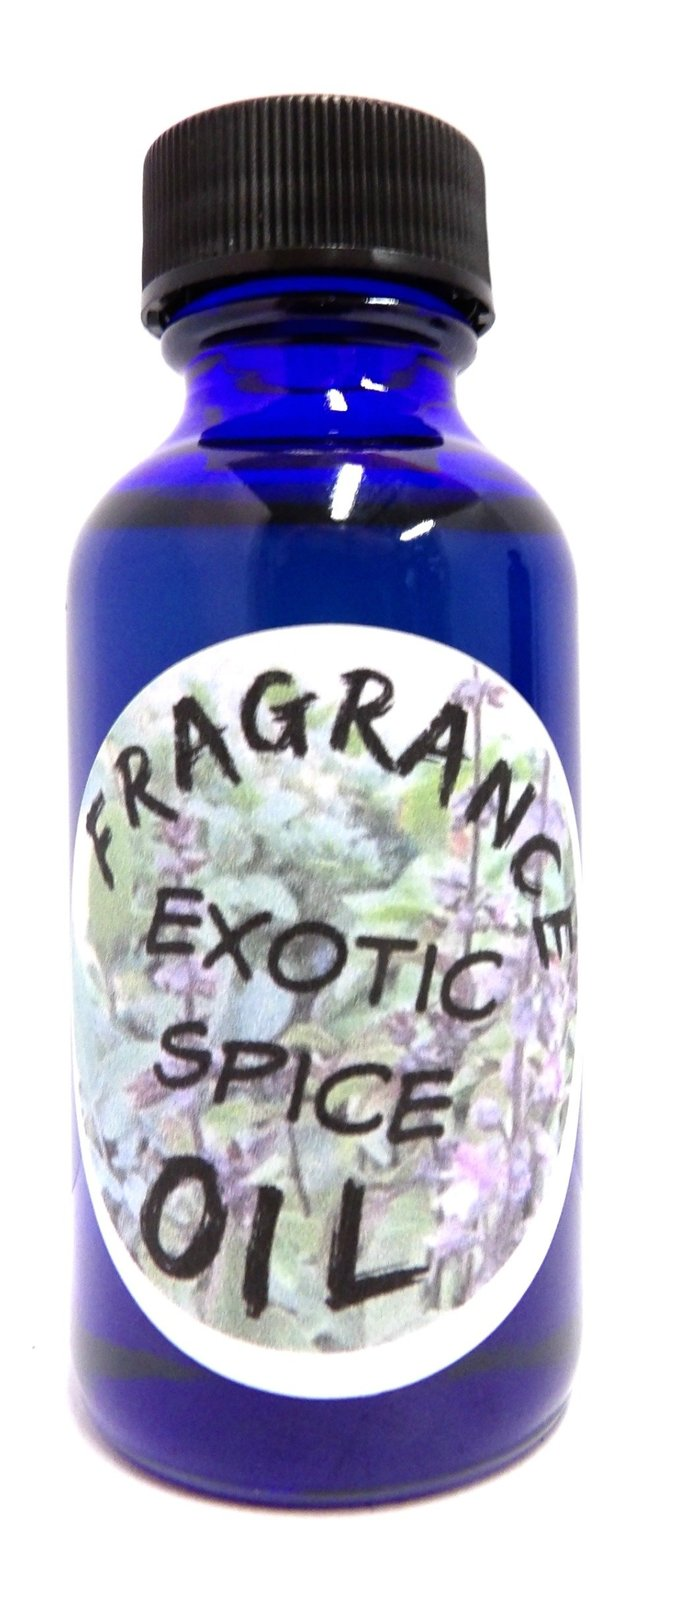 Exotic Spice - 1 Ounce Blue Glass Bottle of Premium Grade Skin Safe Fragrance...